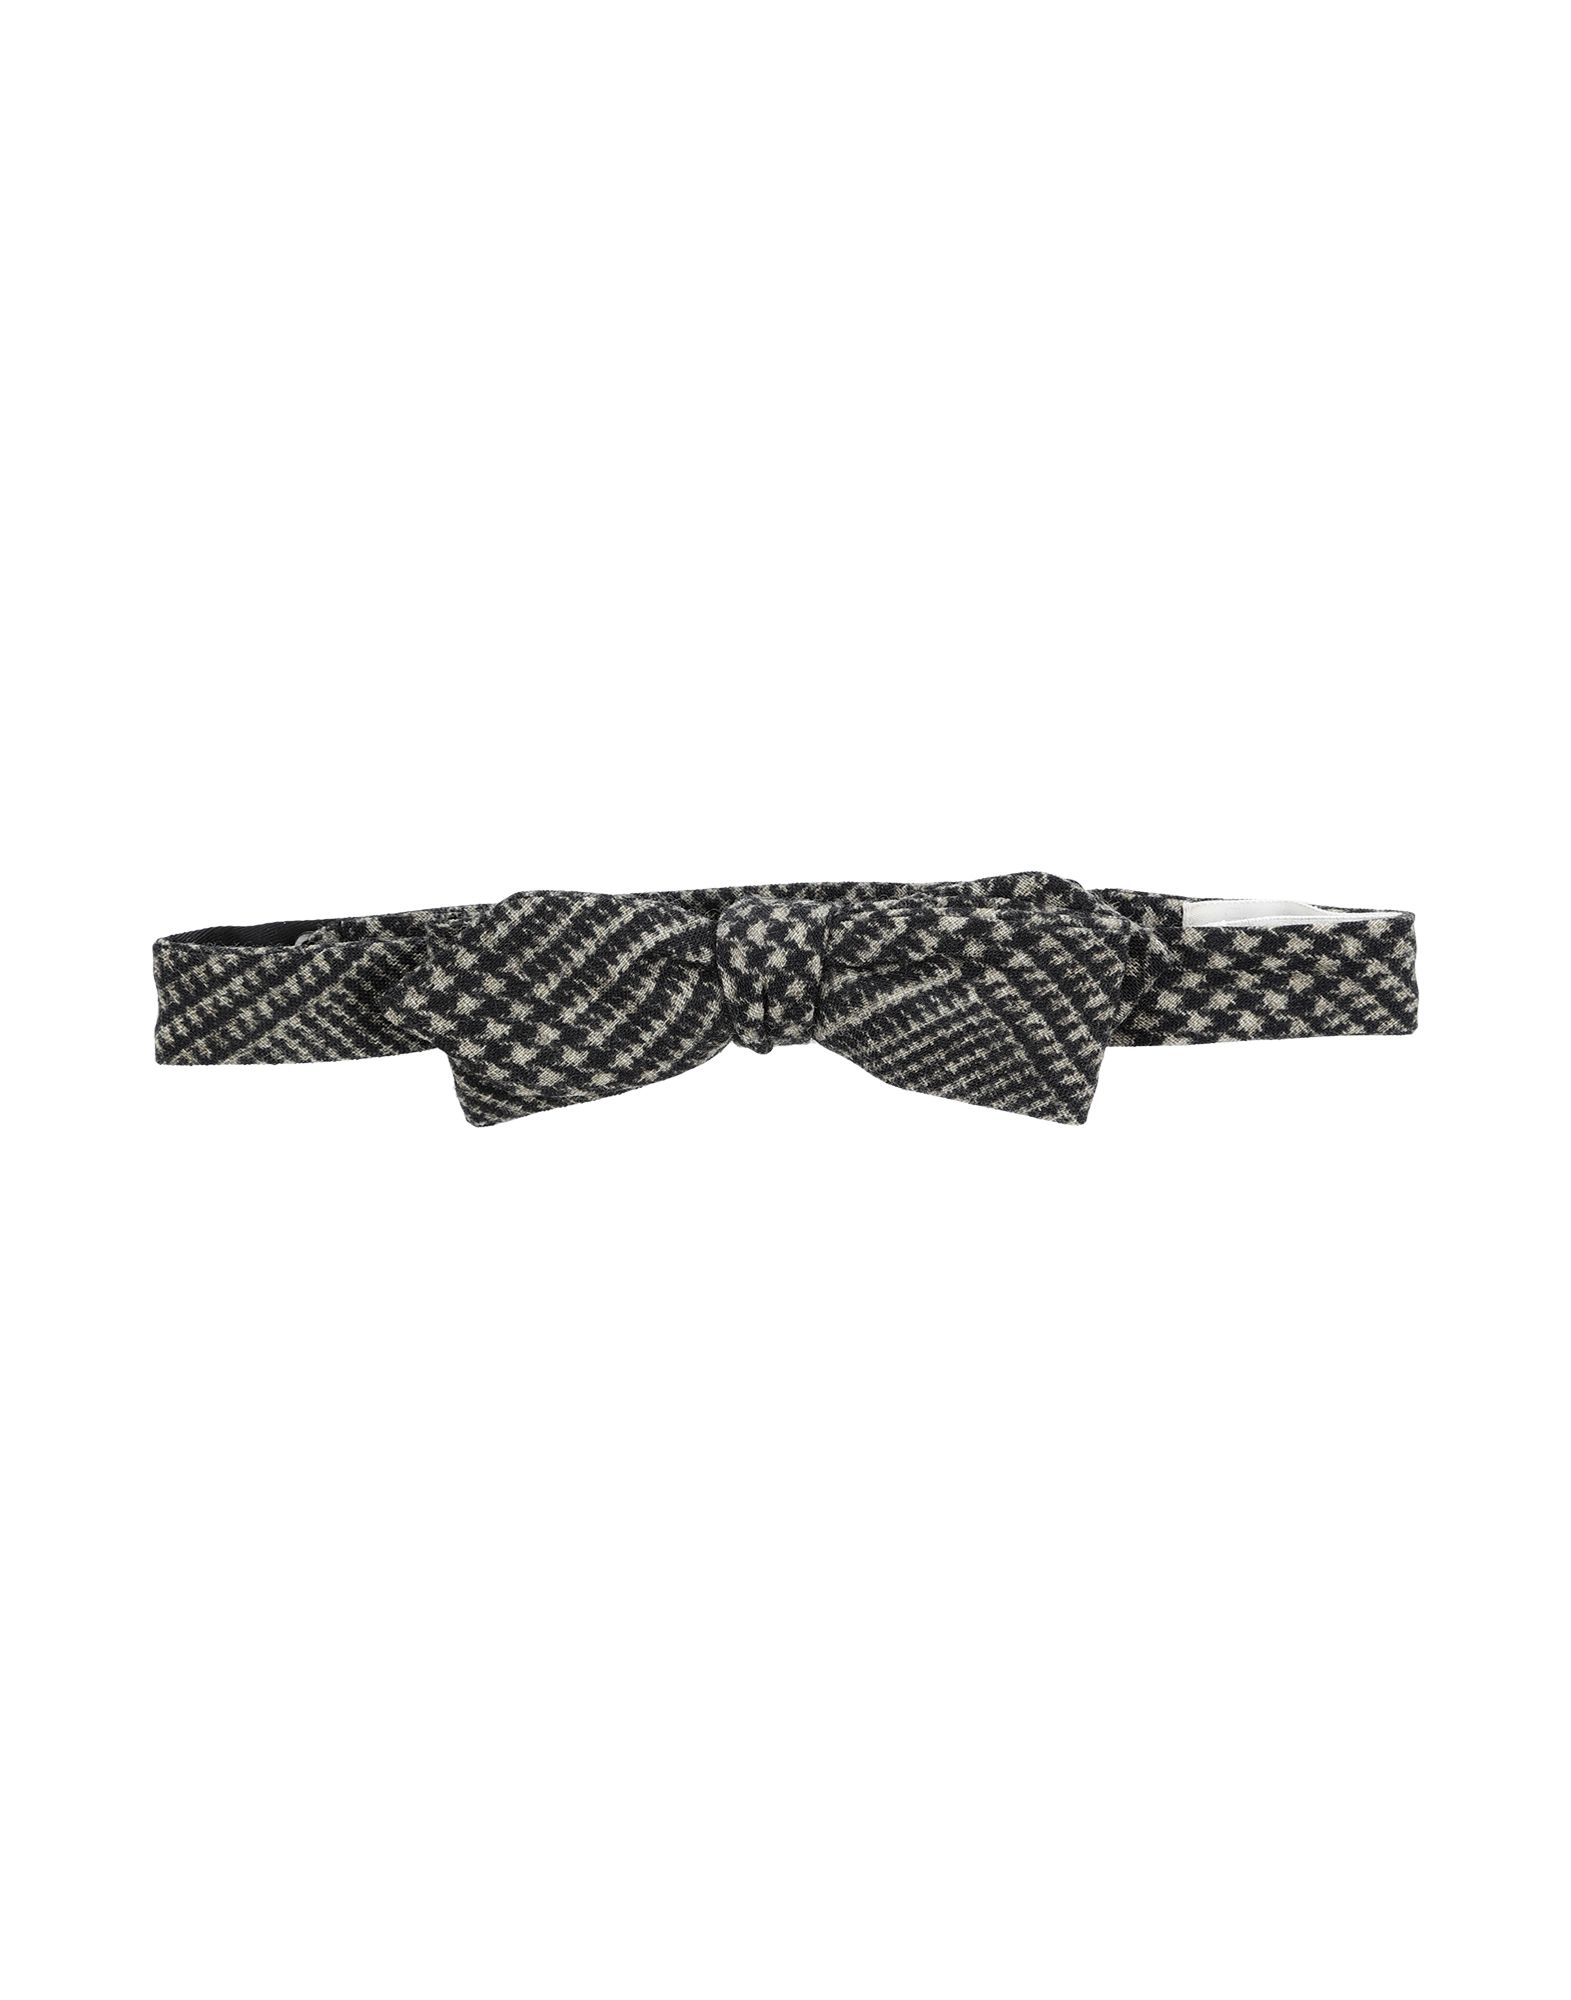 GOLDEN GOOSE DELUXE BRAND Галстук-бабочка украшение на шею галстук бабочка 40 44